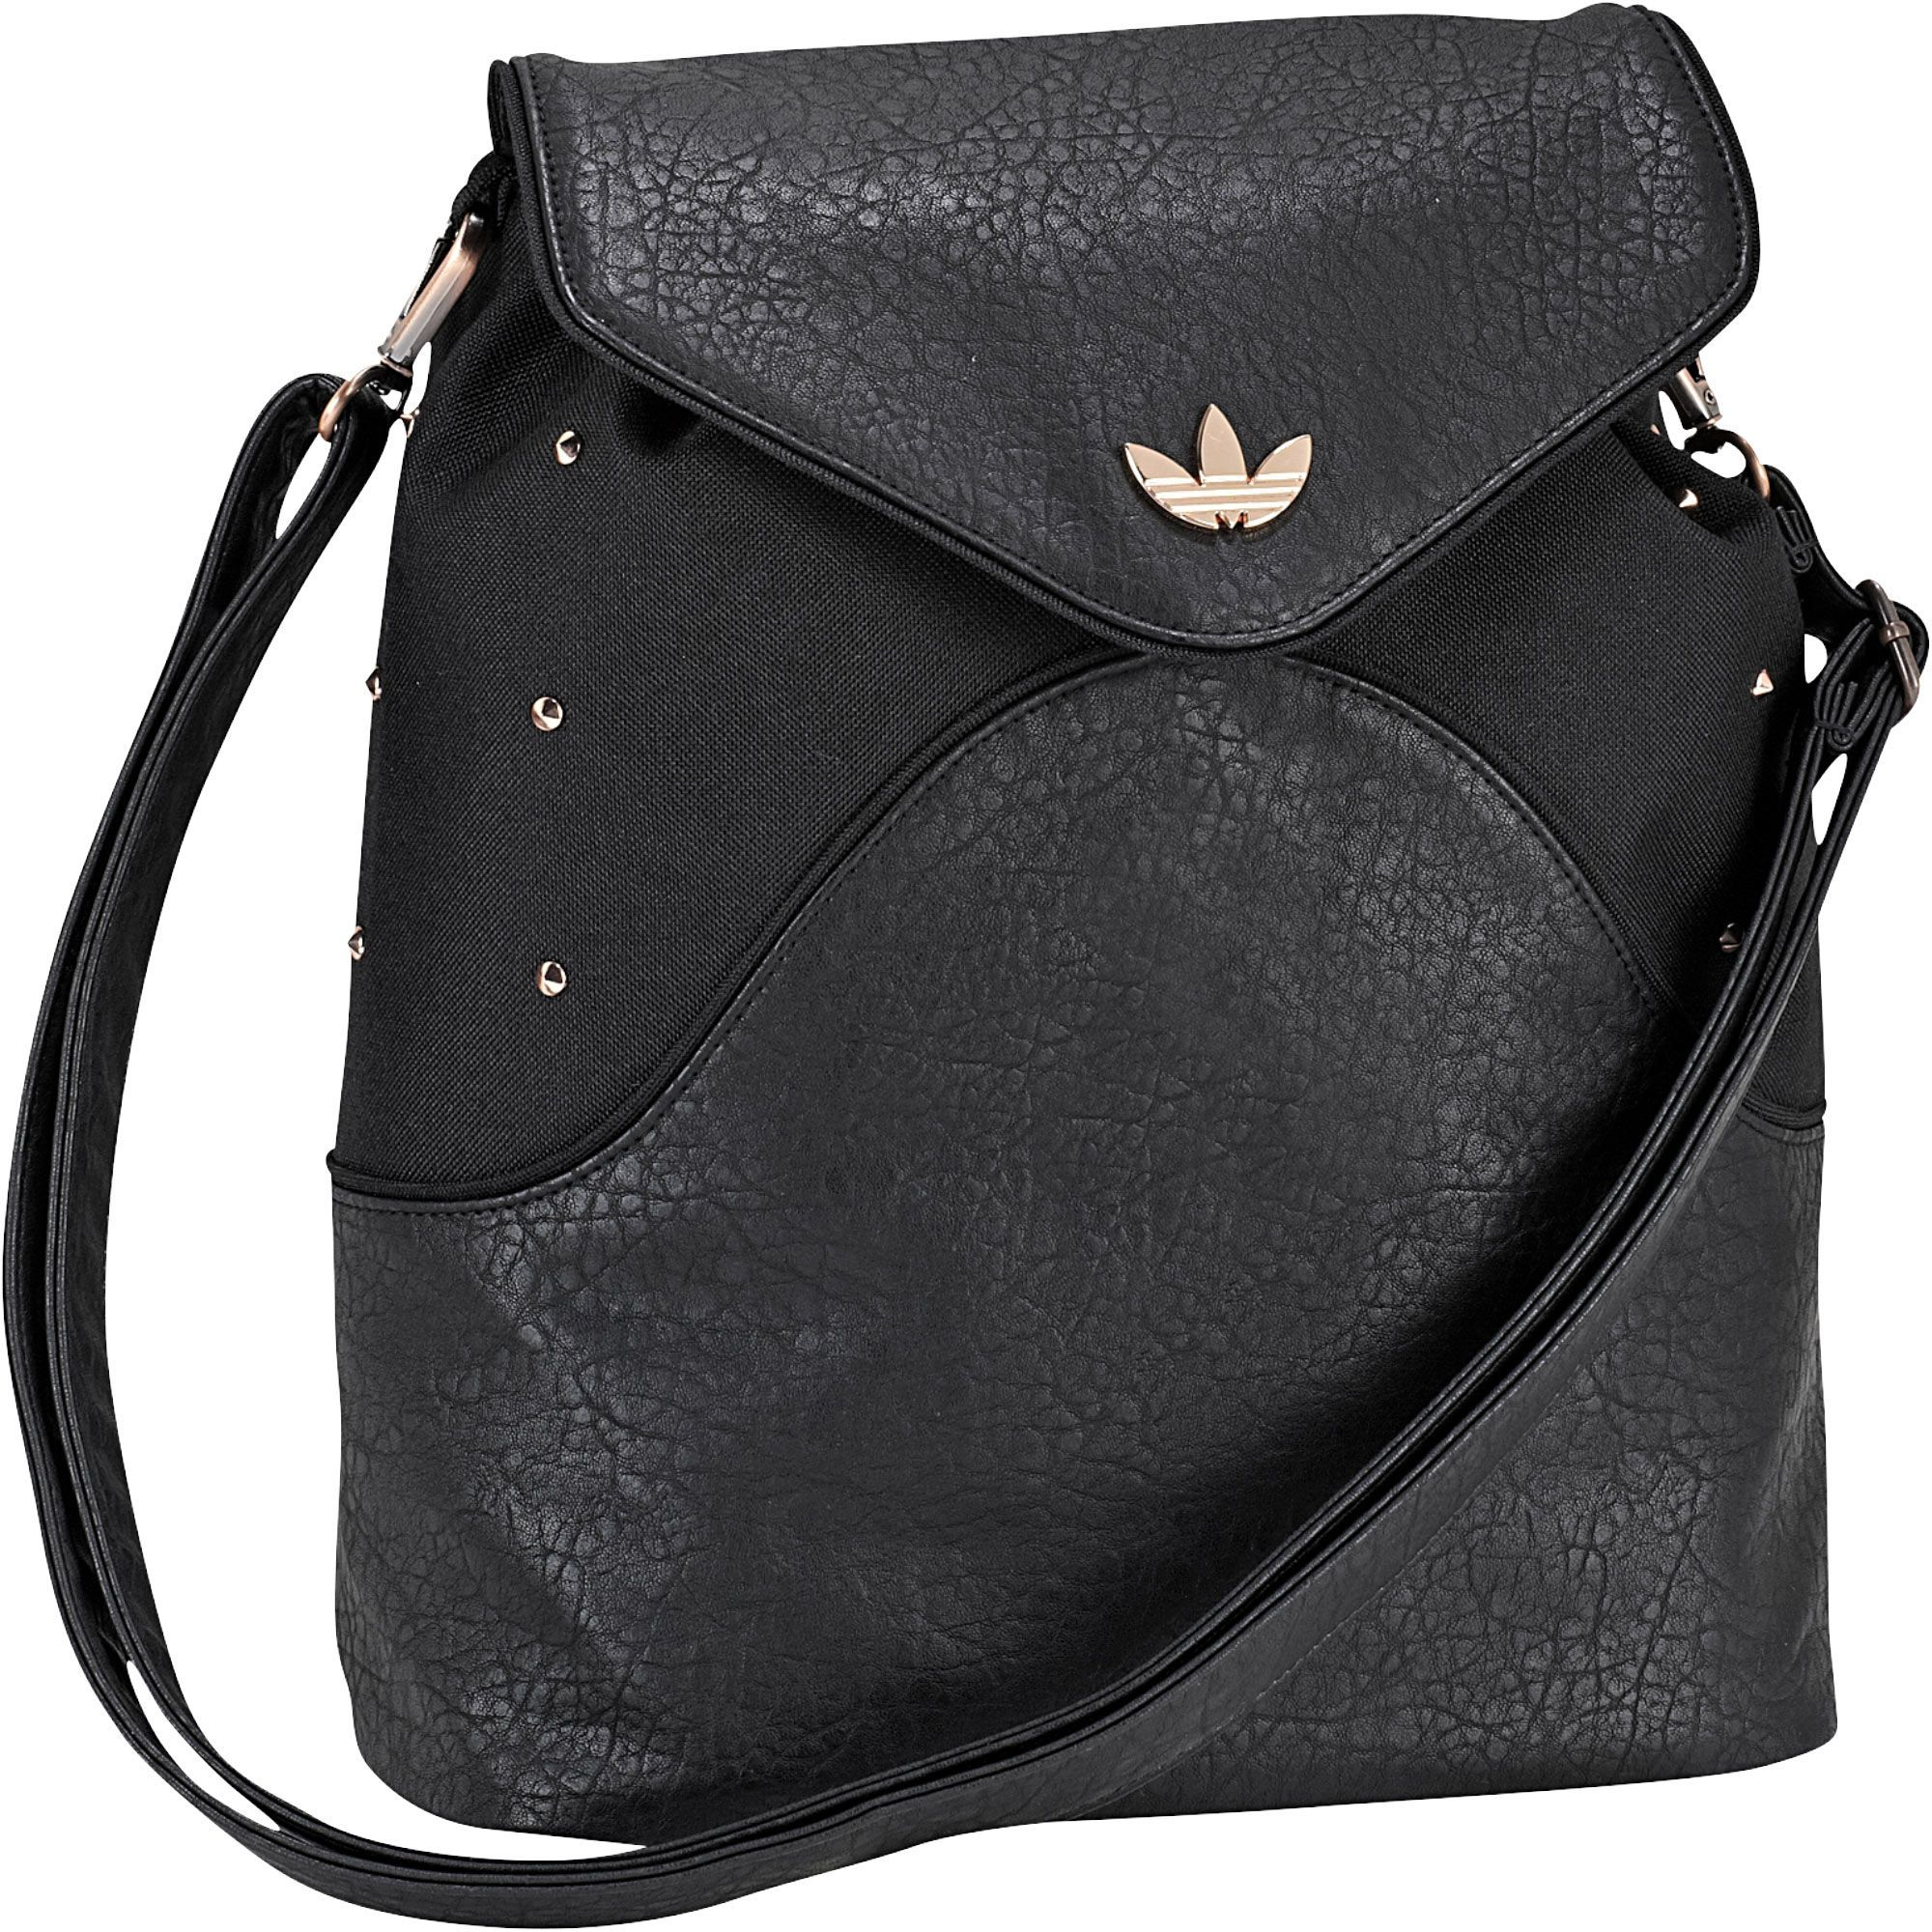 c02f592f3 adidas - Cartera Originals Grunge Mujer | Fashion | Grunge backpack ...